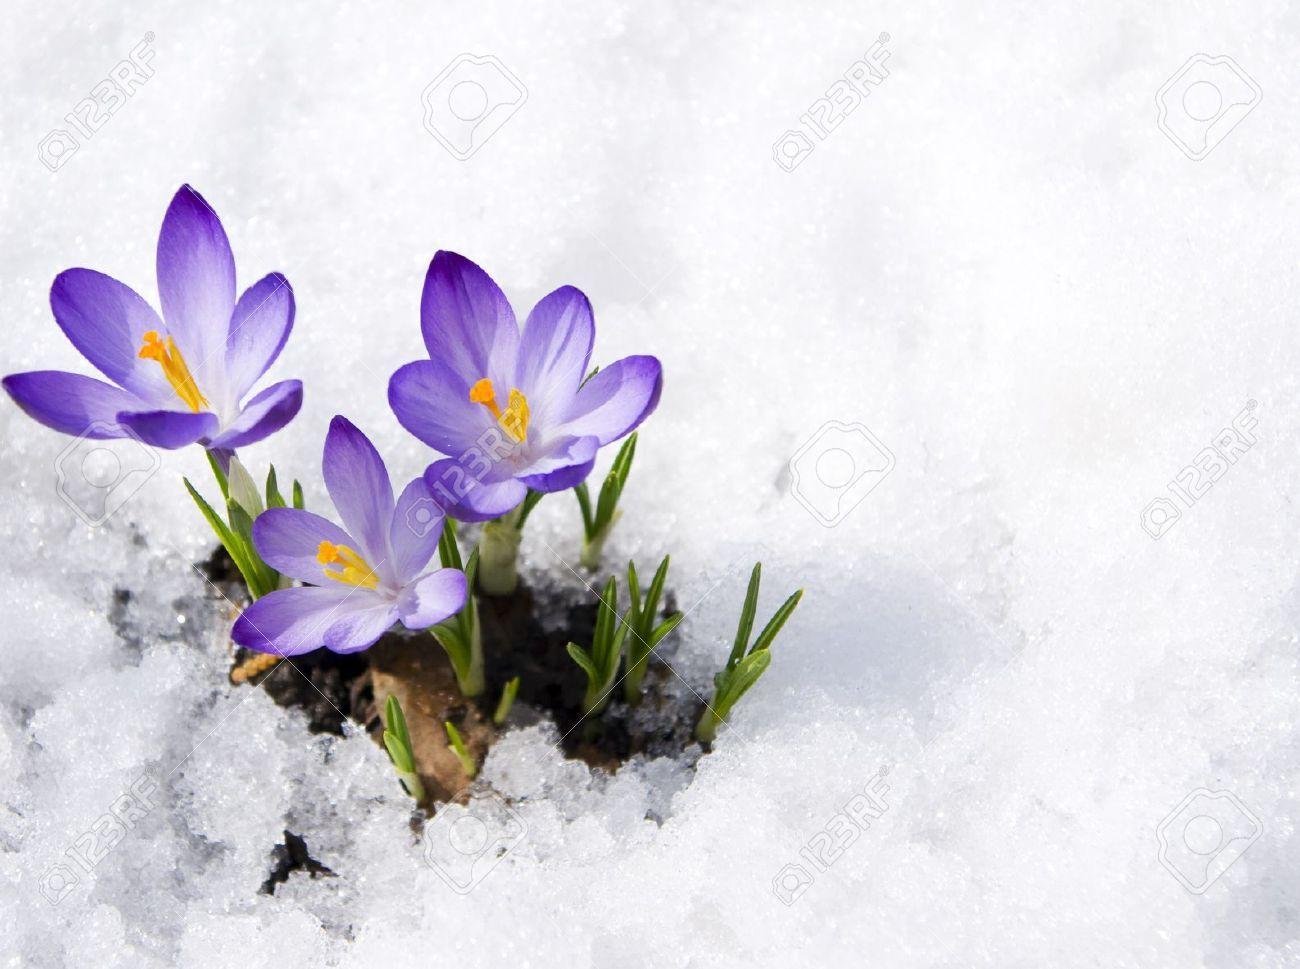 Image result for crocuses pinterest winter garden image result for crocuses mightylinksfo